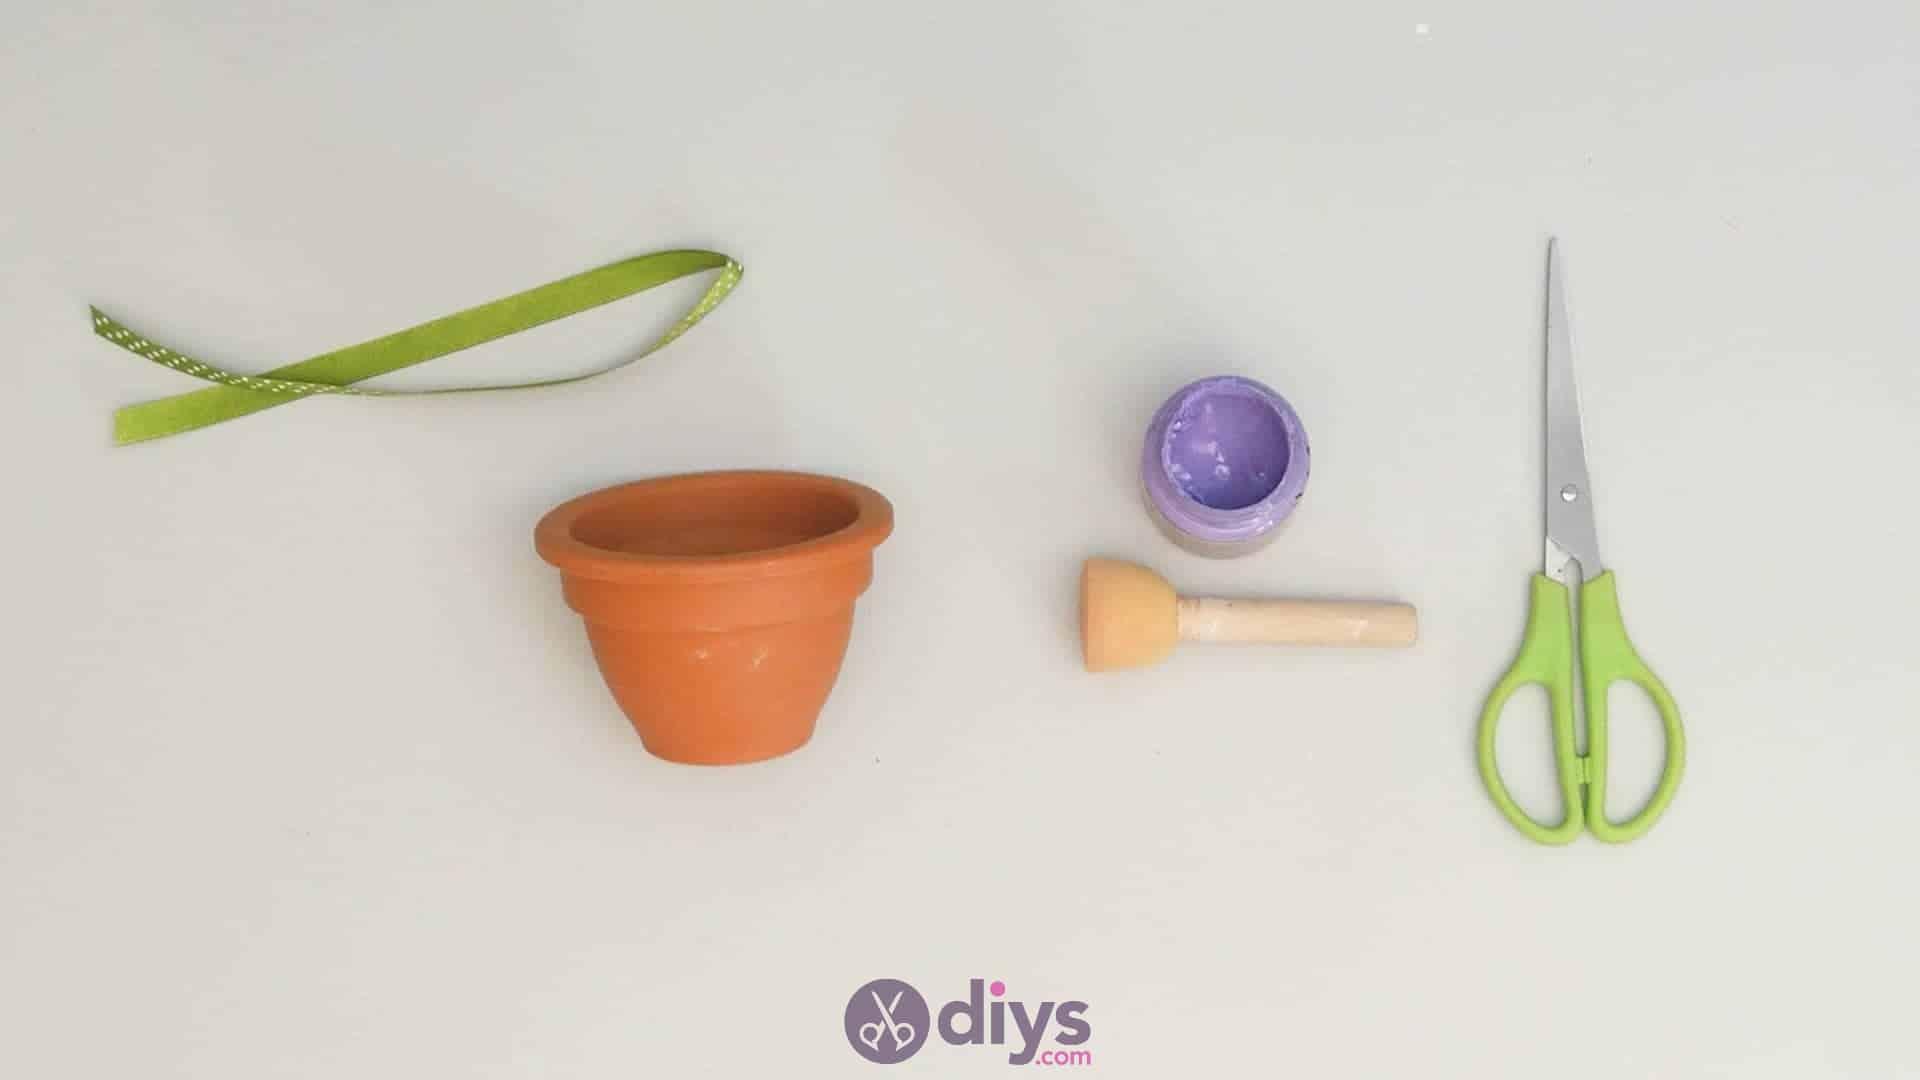 Diy colourful flower pot step 2